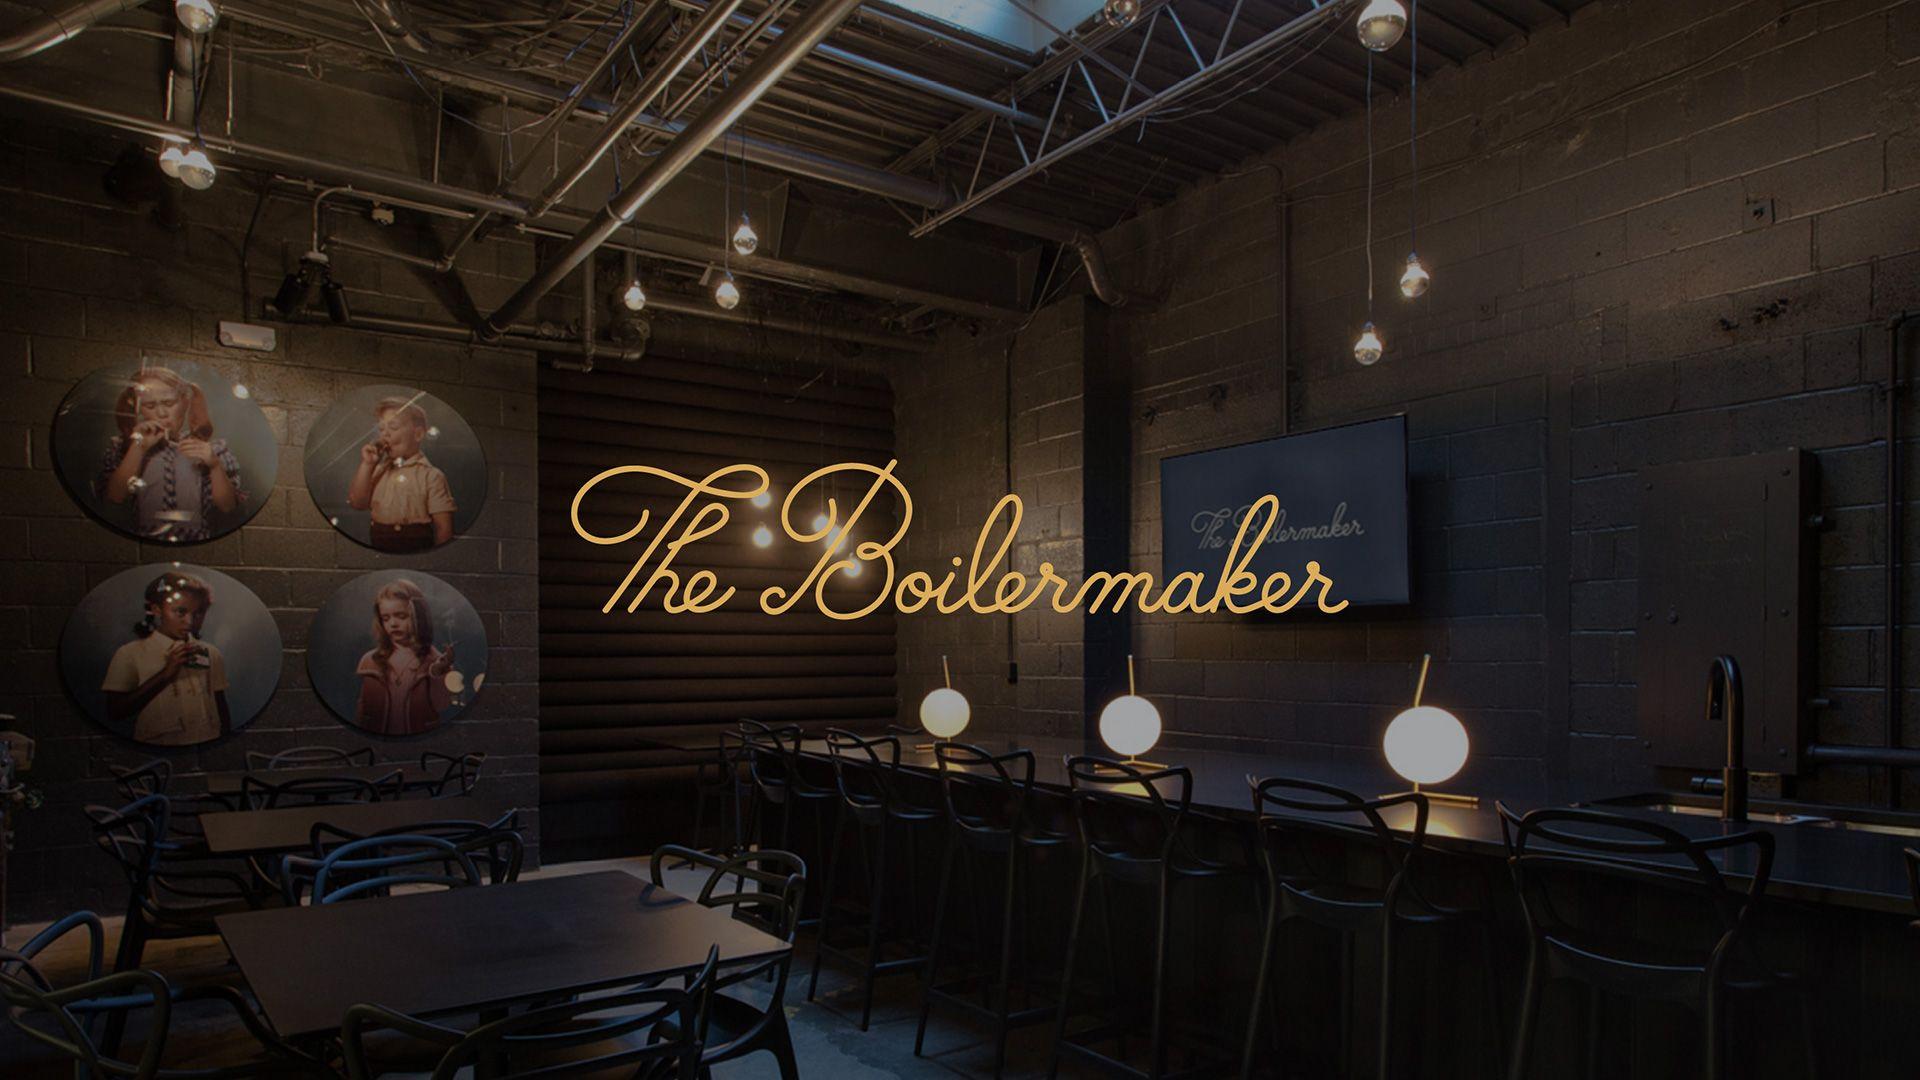 SamSmall Web-Grocers Warehouse-Boilermaker Logo Overlay